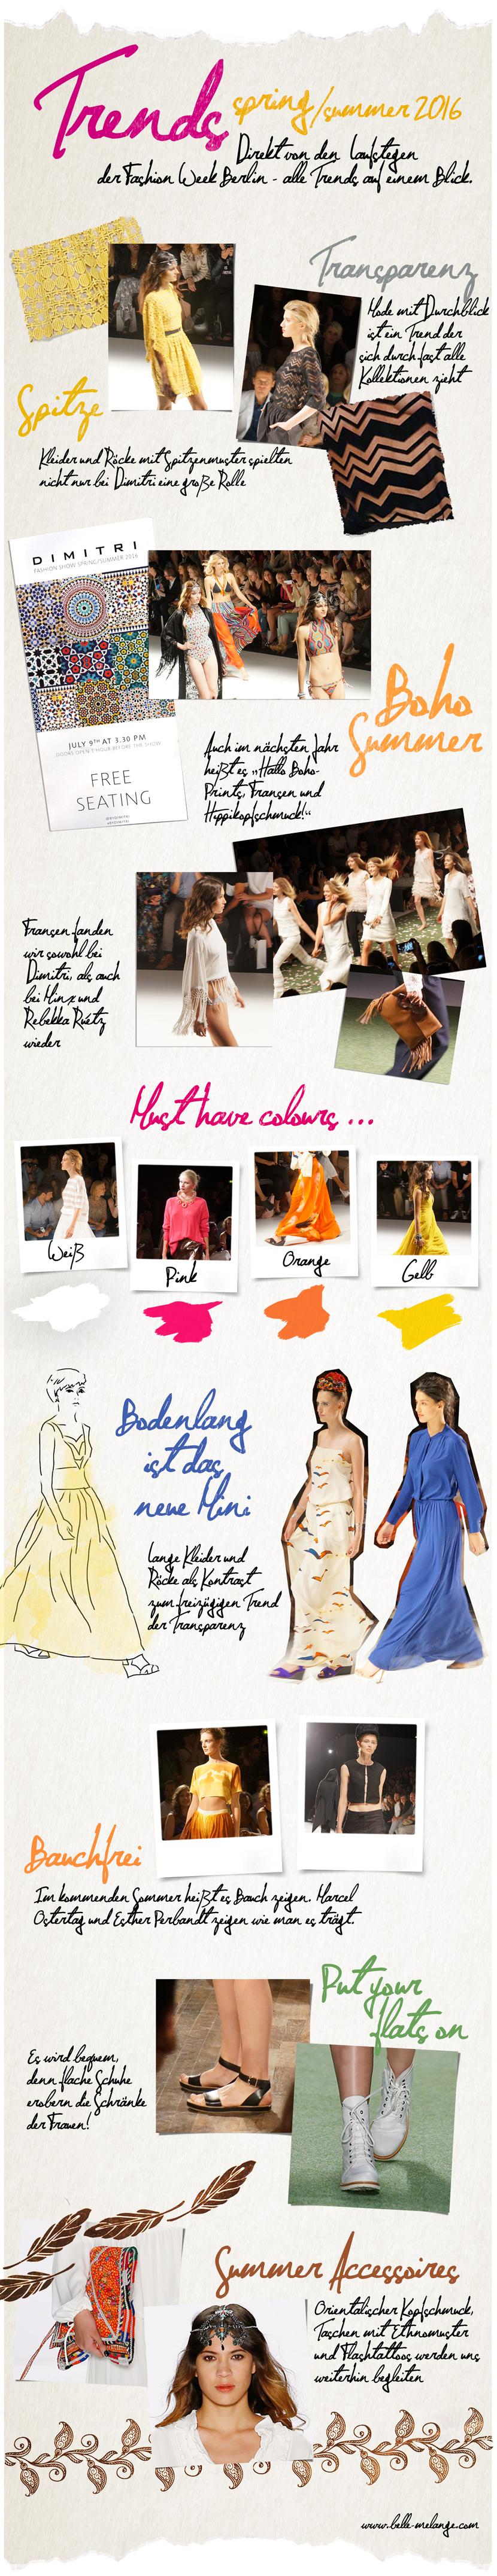 Trends-SpringSummer2016-FashionWeekBerlin-MBFW-BelleMelange